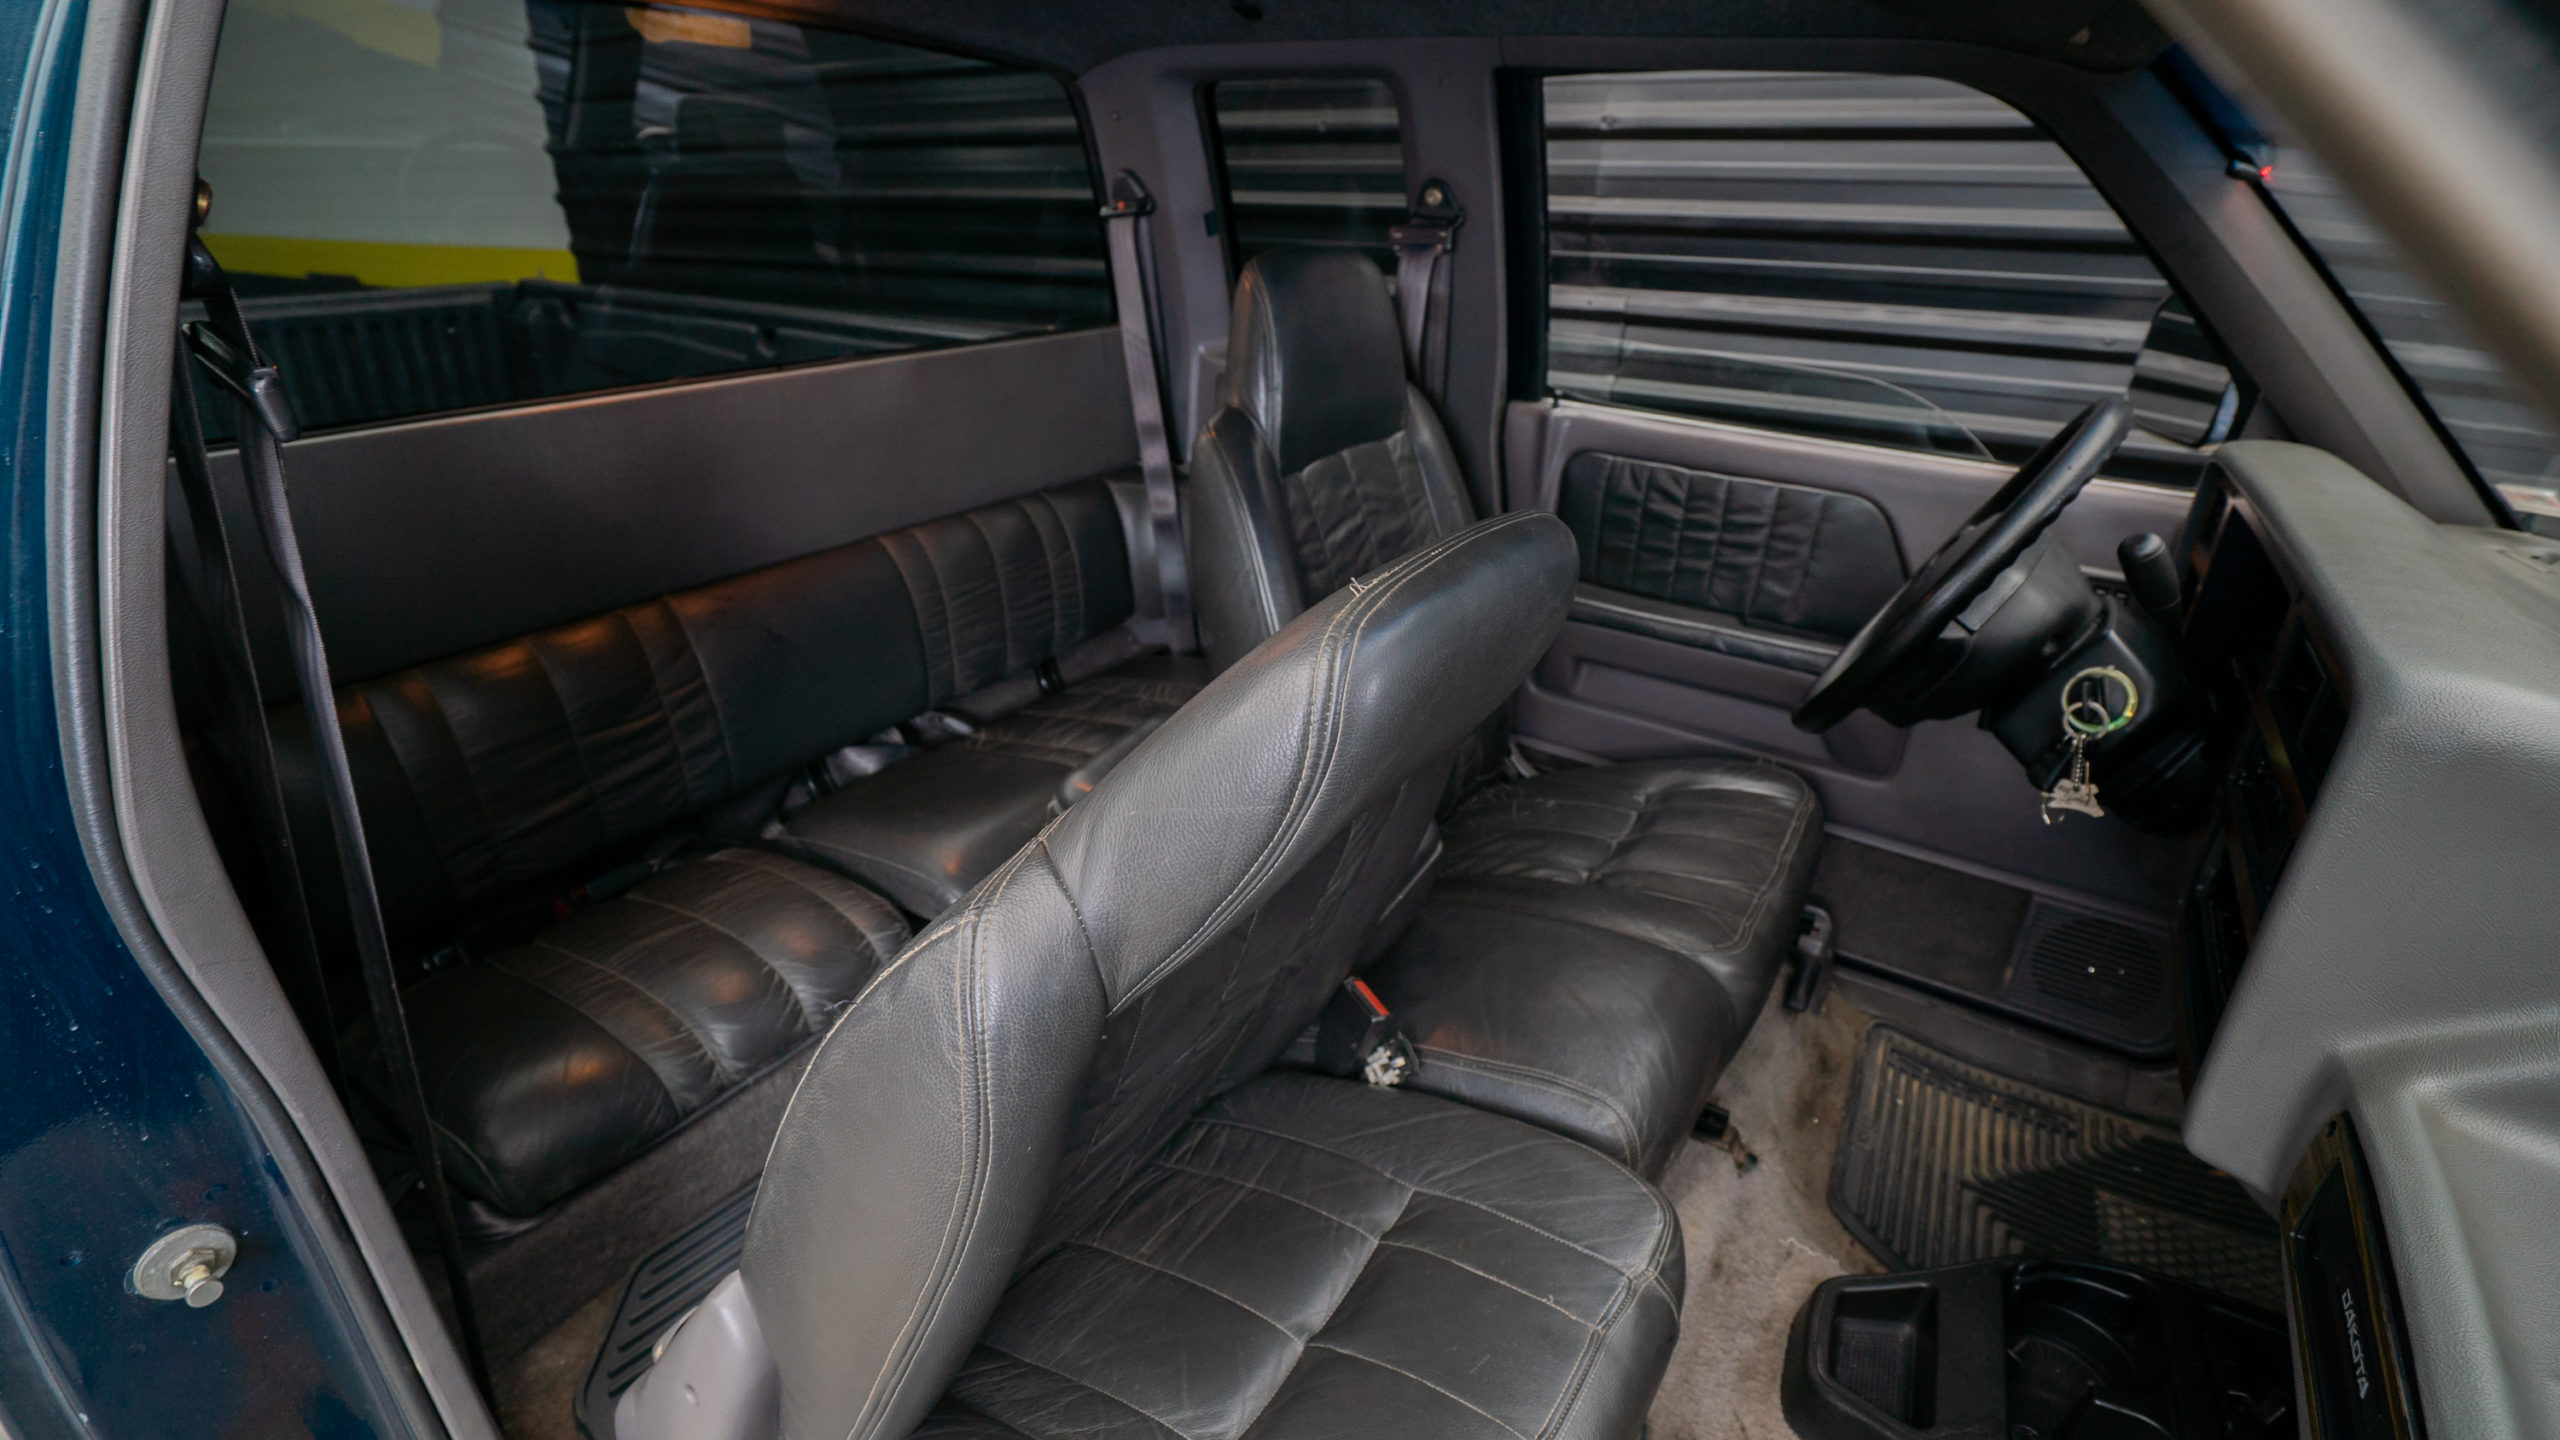 1995 Dodge Dakota Slt V8 Magnum The Garage